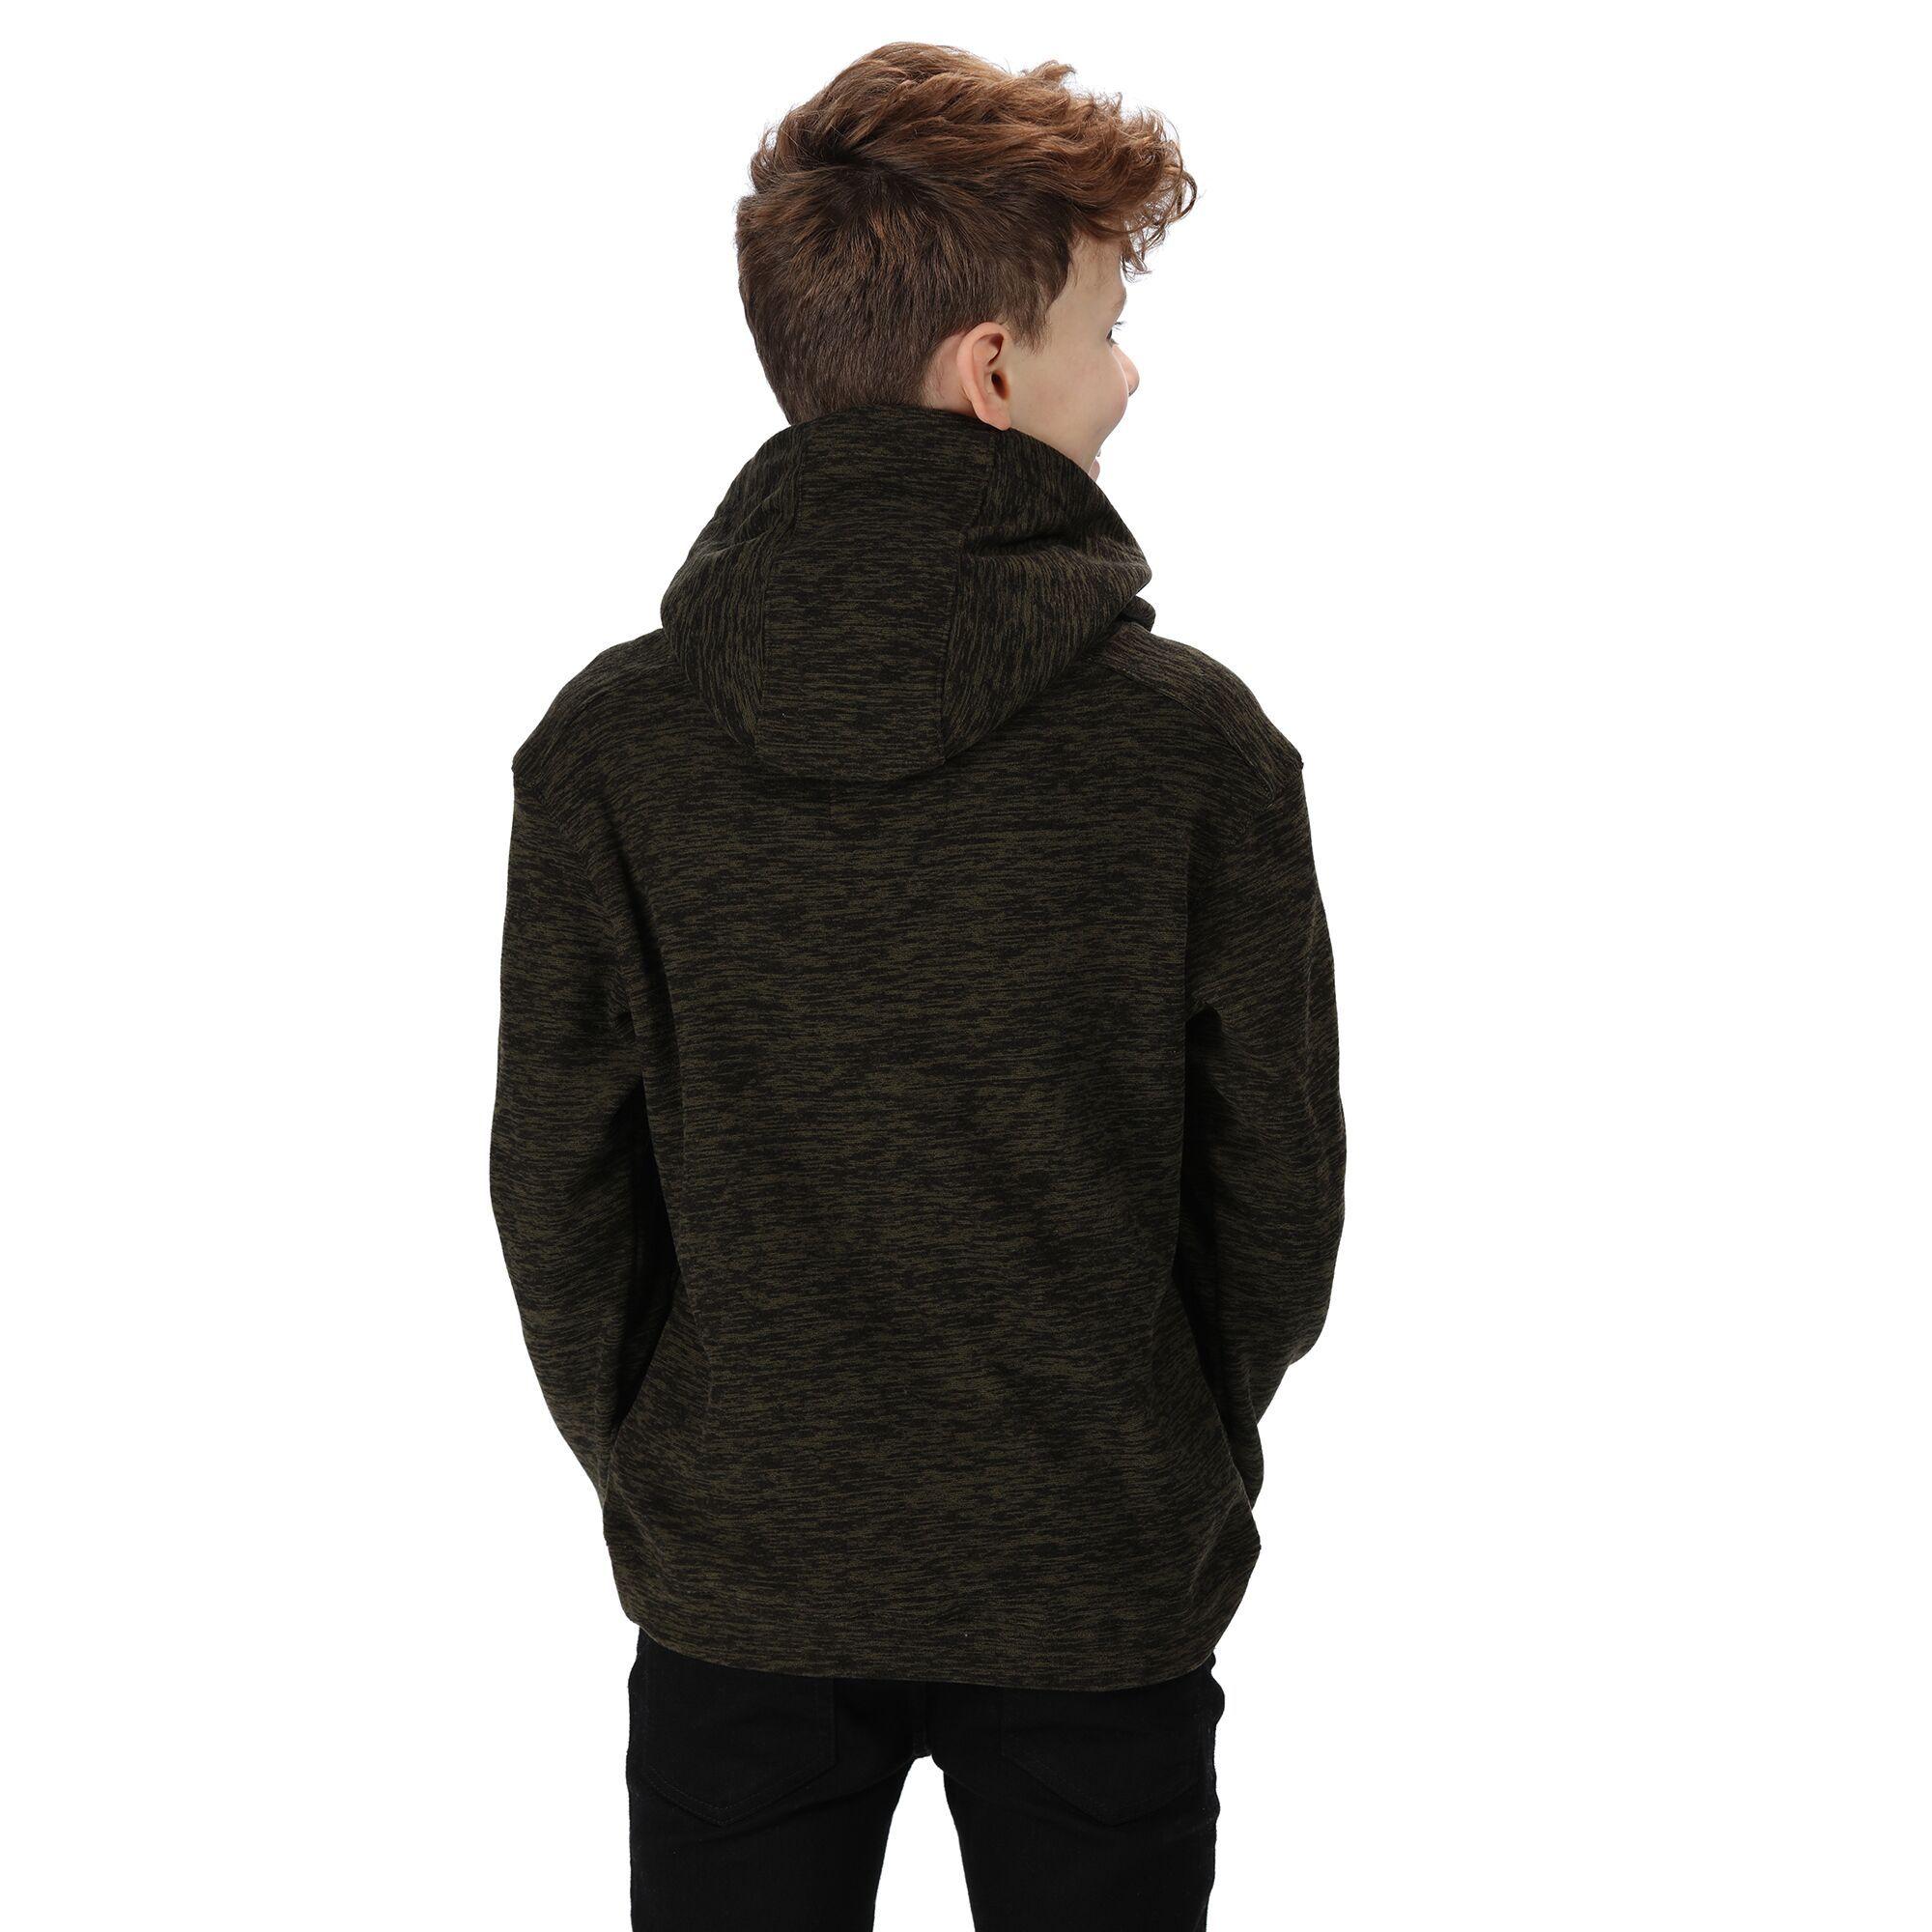 Regatta Childrens/Kids Keyon Hooded Fleece